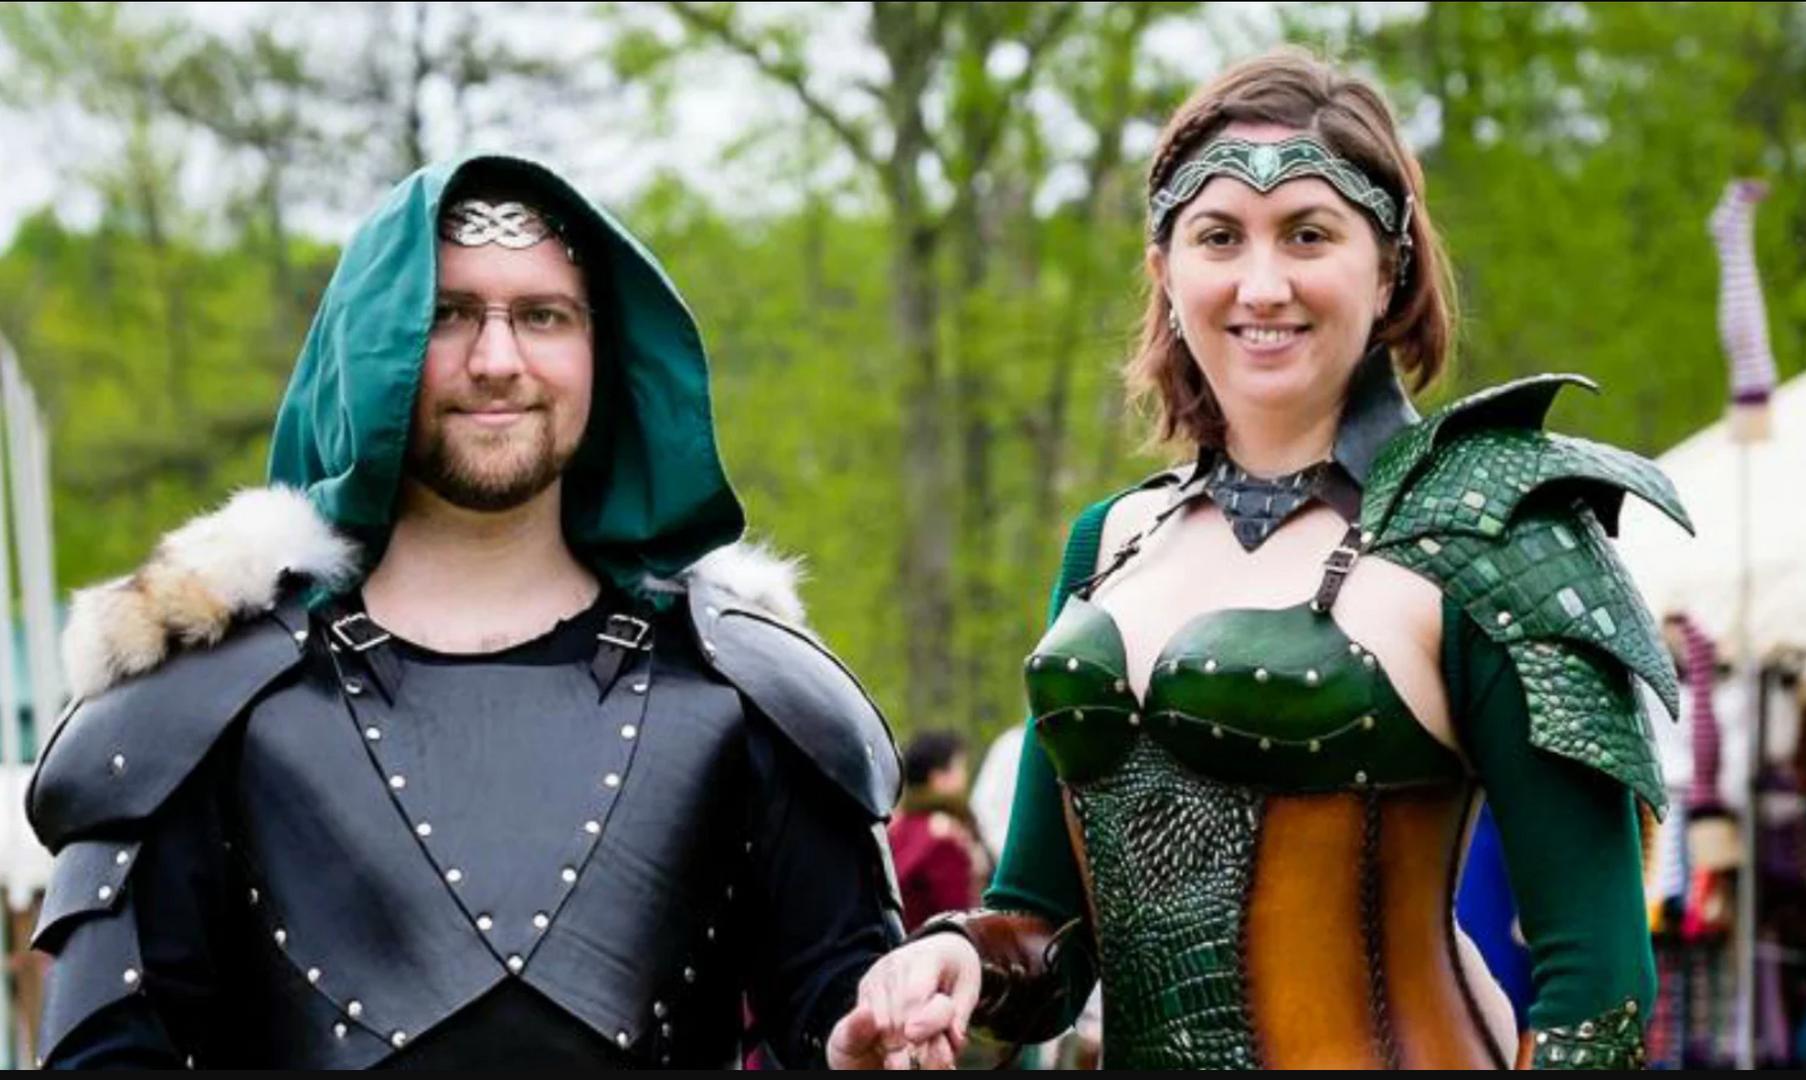 Wedding Armor